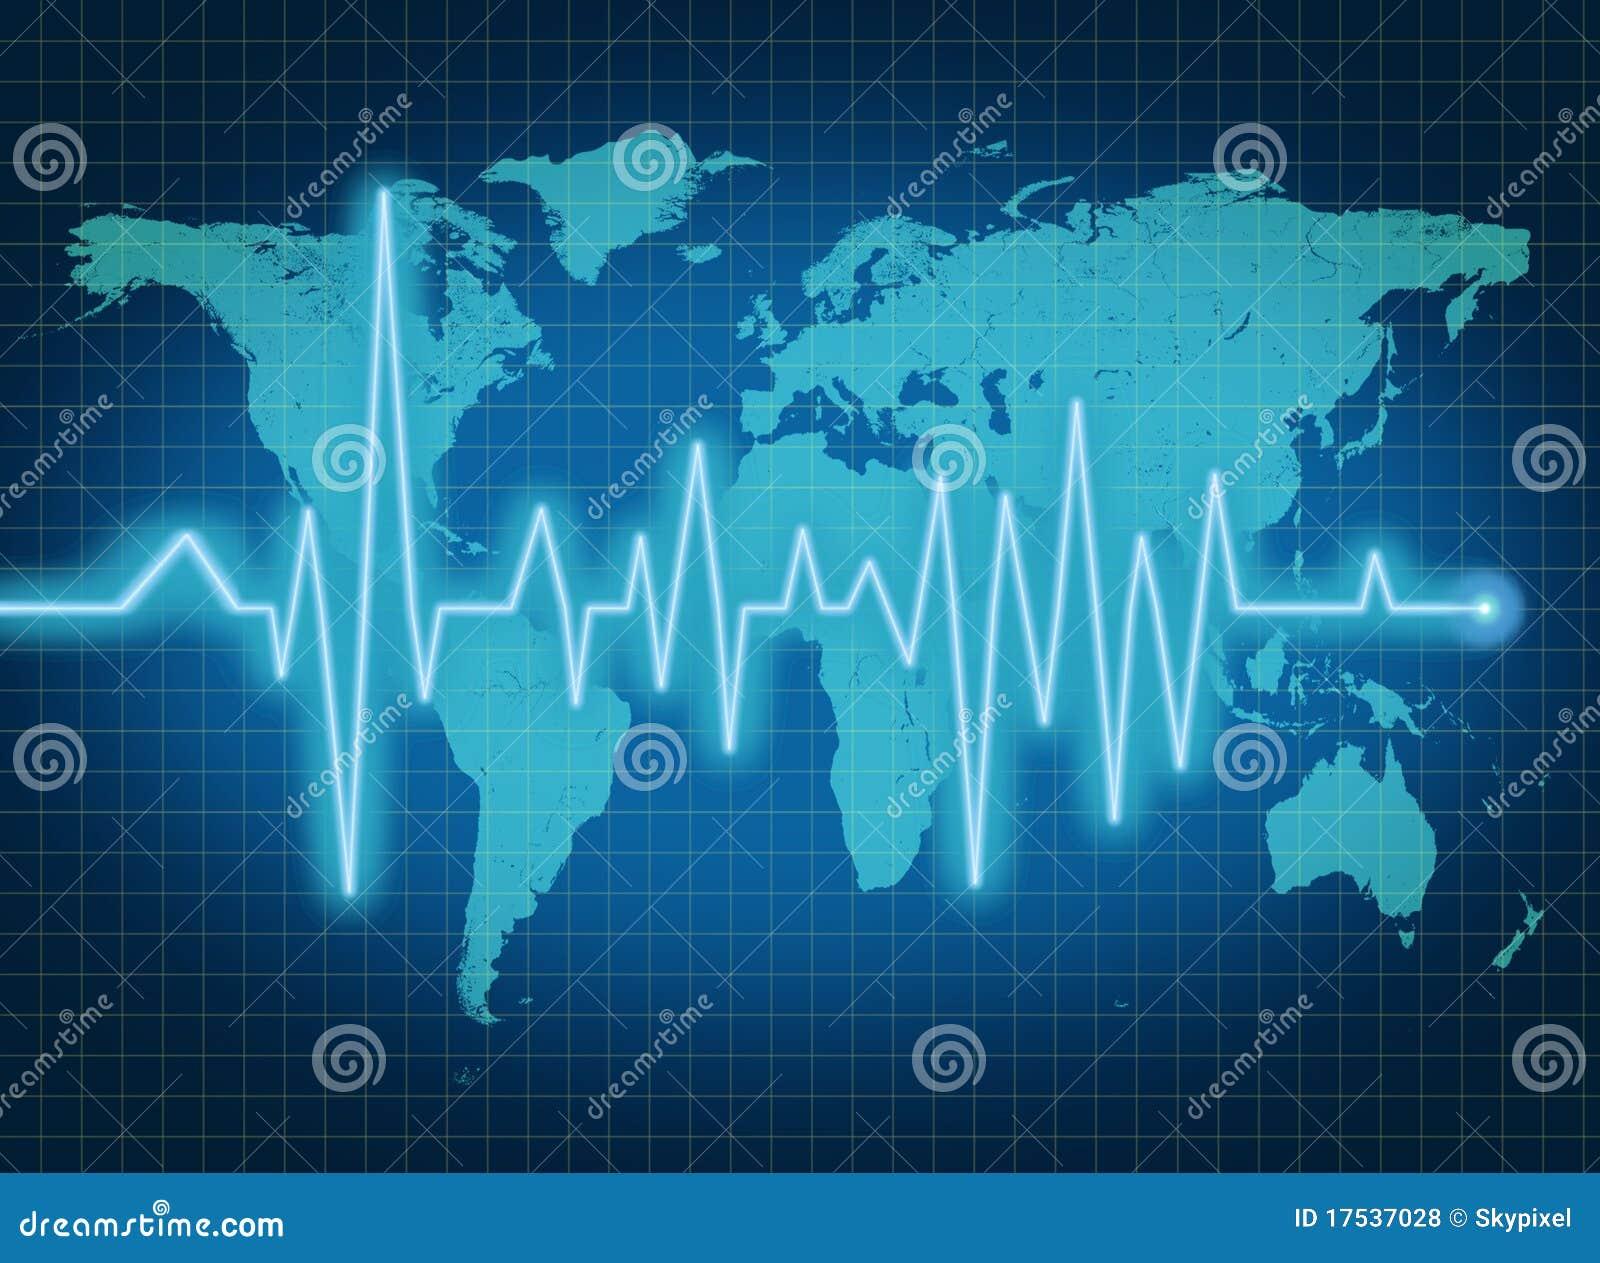 EKG ECG world health economy blue map